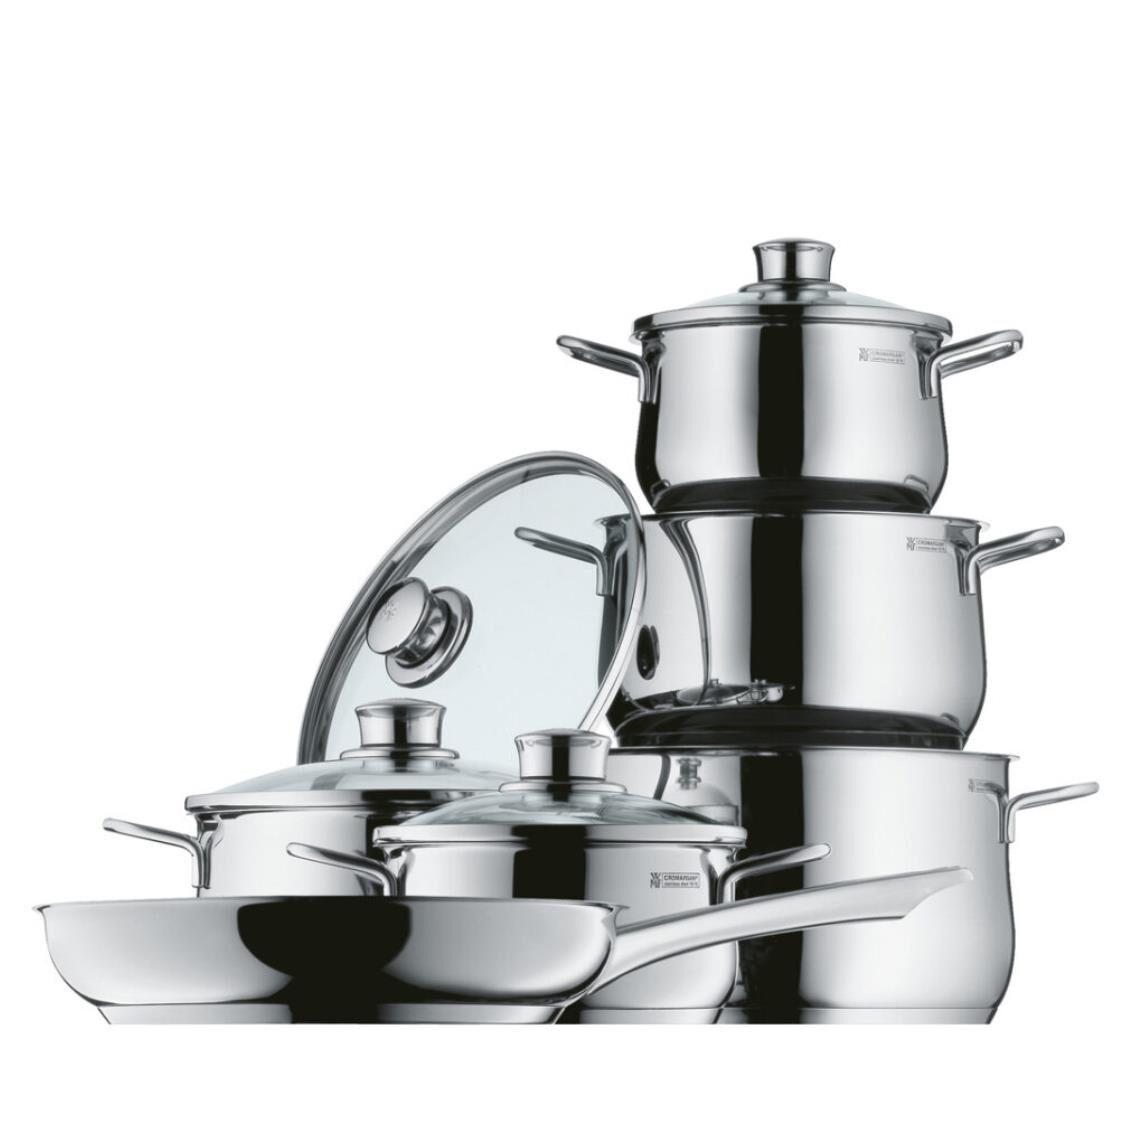 WMF Diadem Plus 6pc Cookware Set